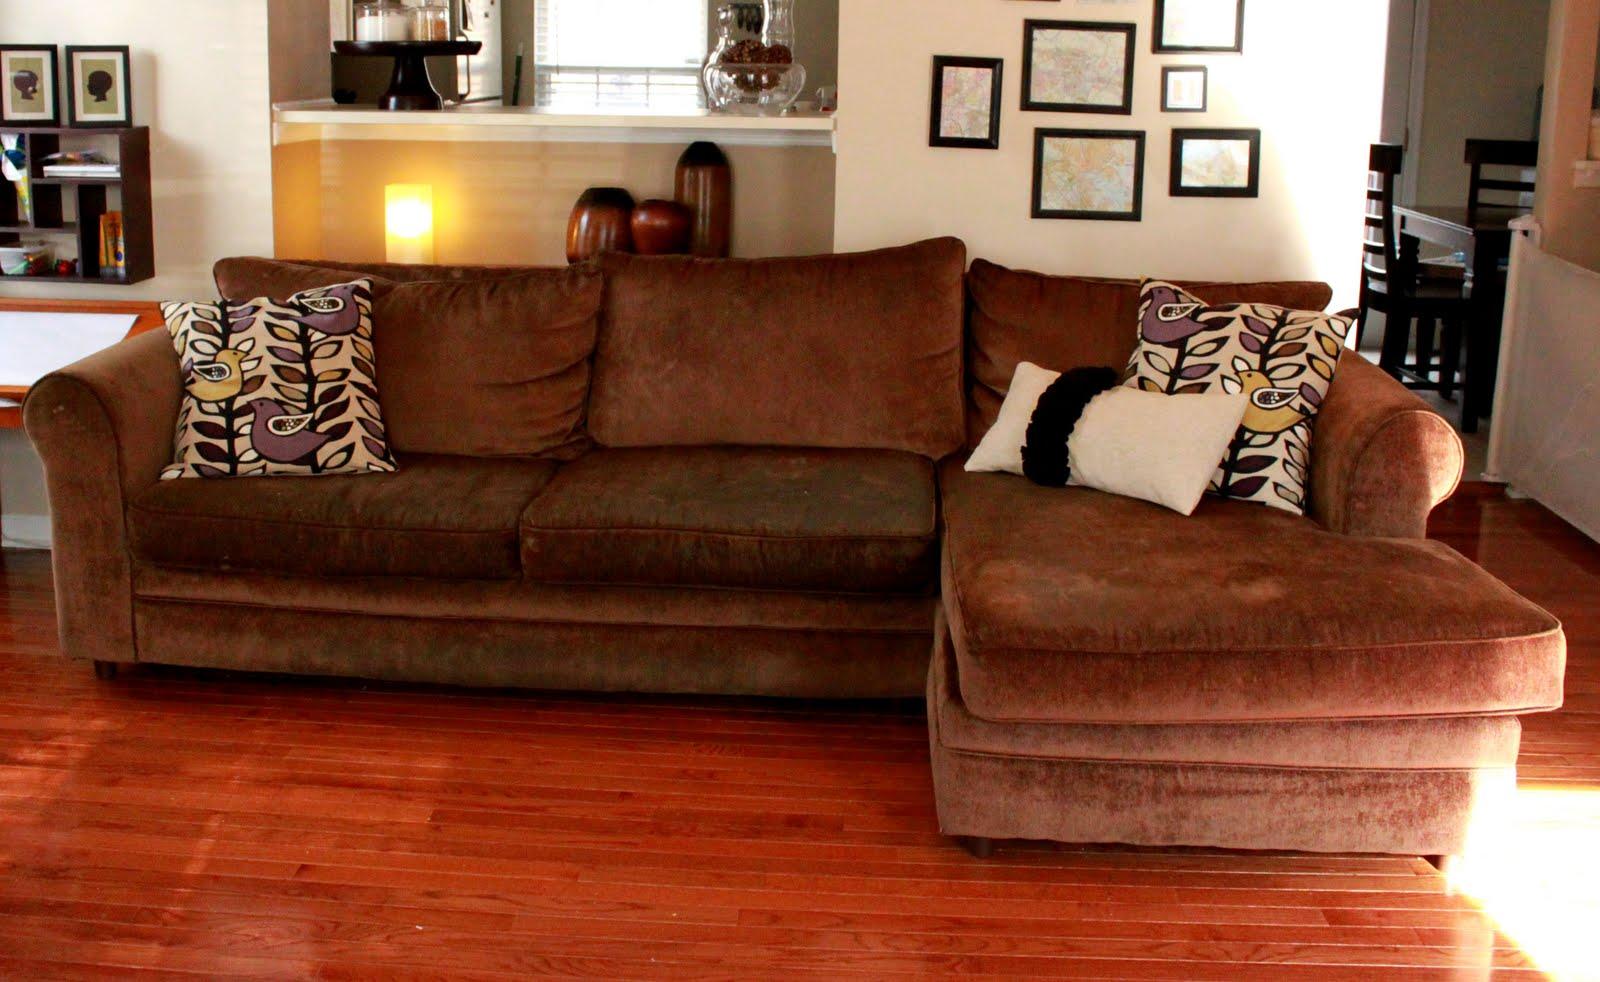 Nasty Sofa? Slipcover It!